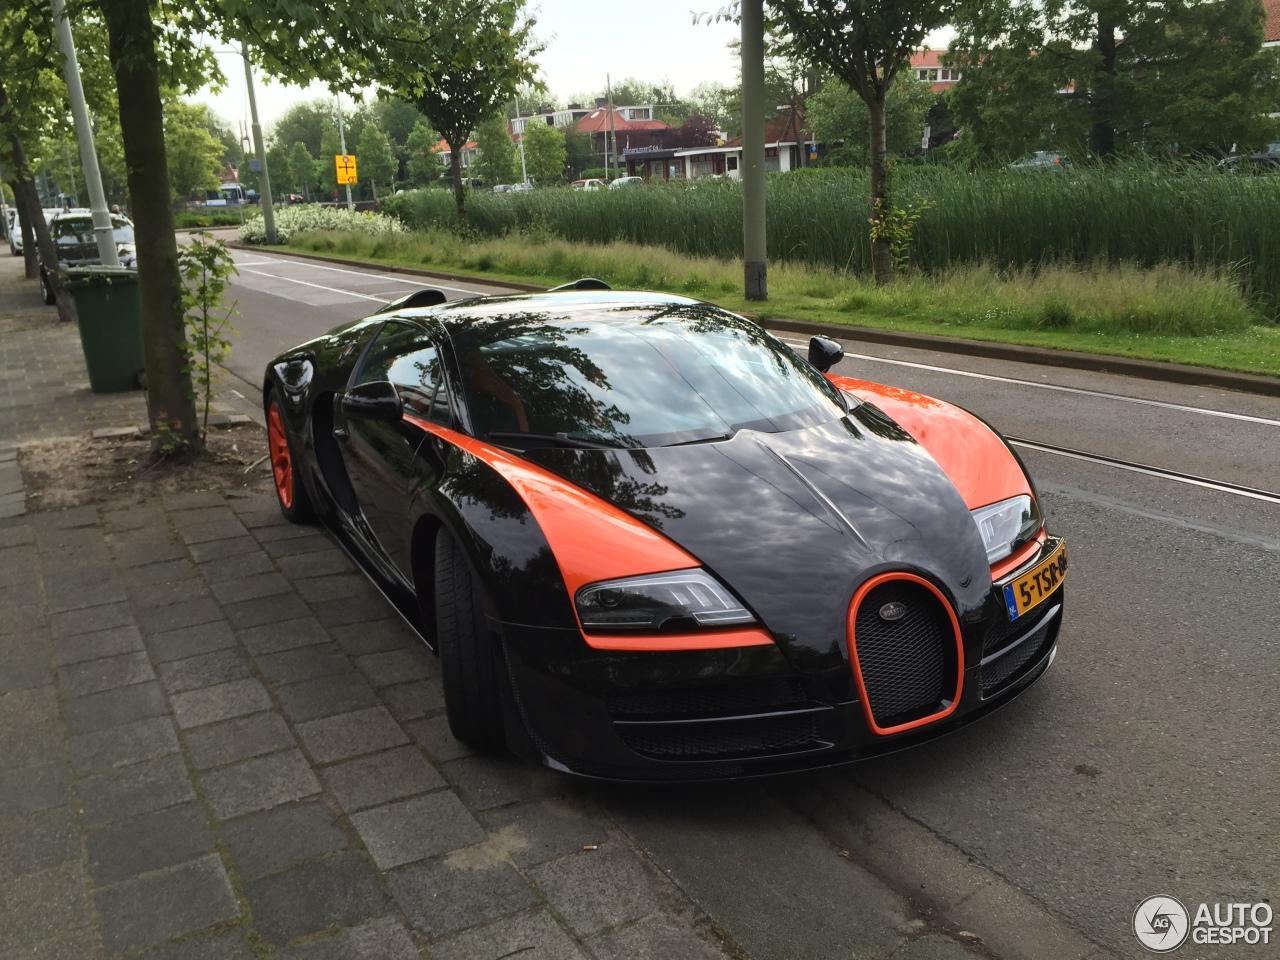 bugatti veyron 16 4 grand sport vitesse world record car edition 14 october. Black Bedroom Furniture Sets. Home Design Ideas